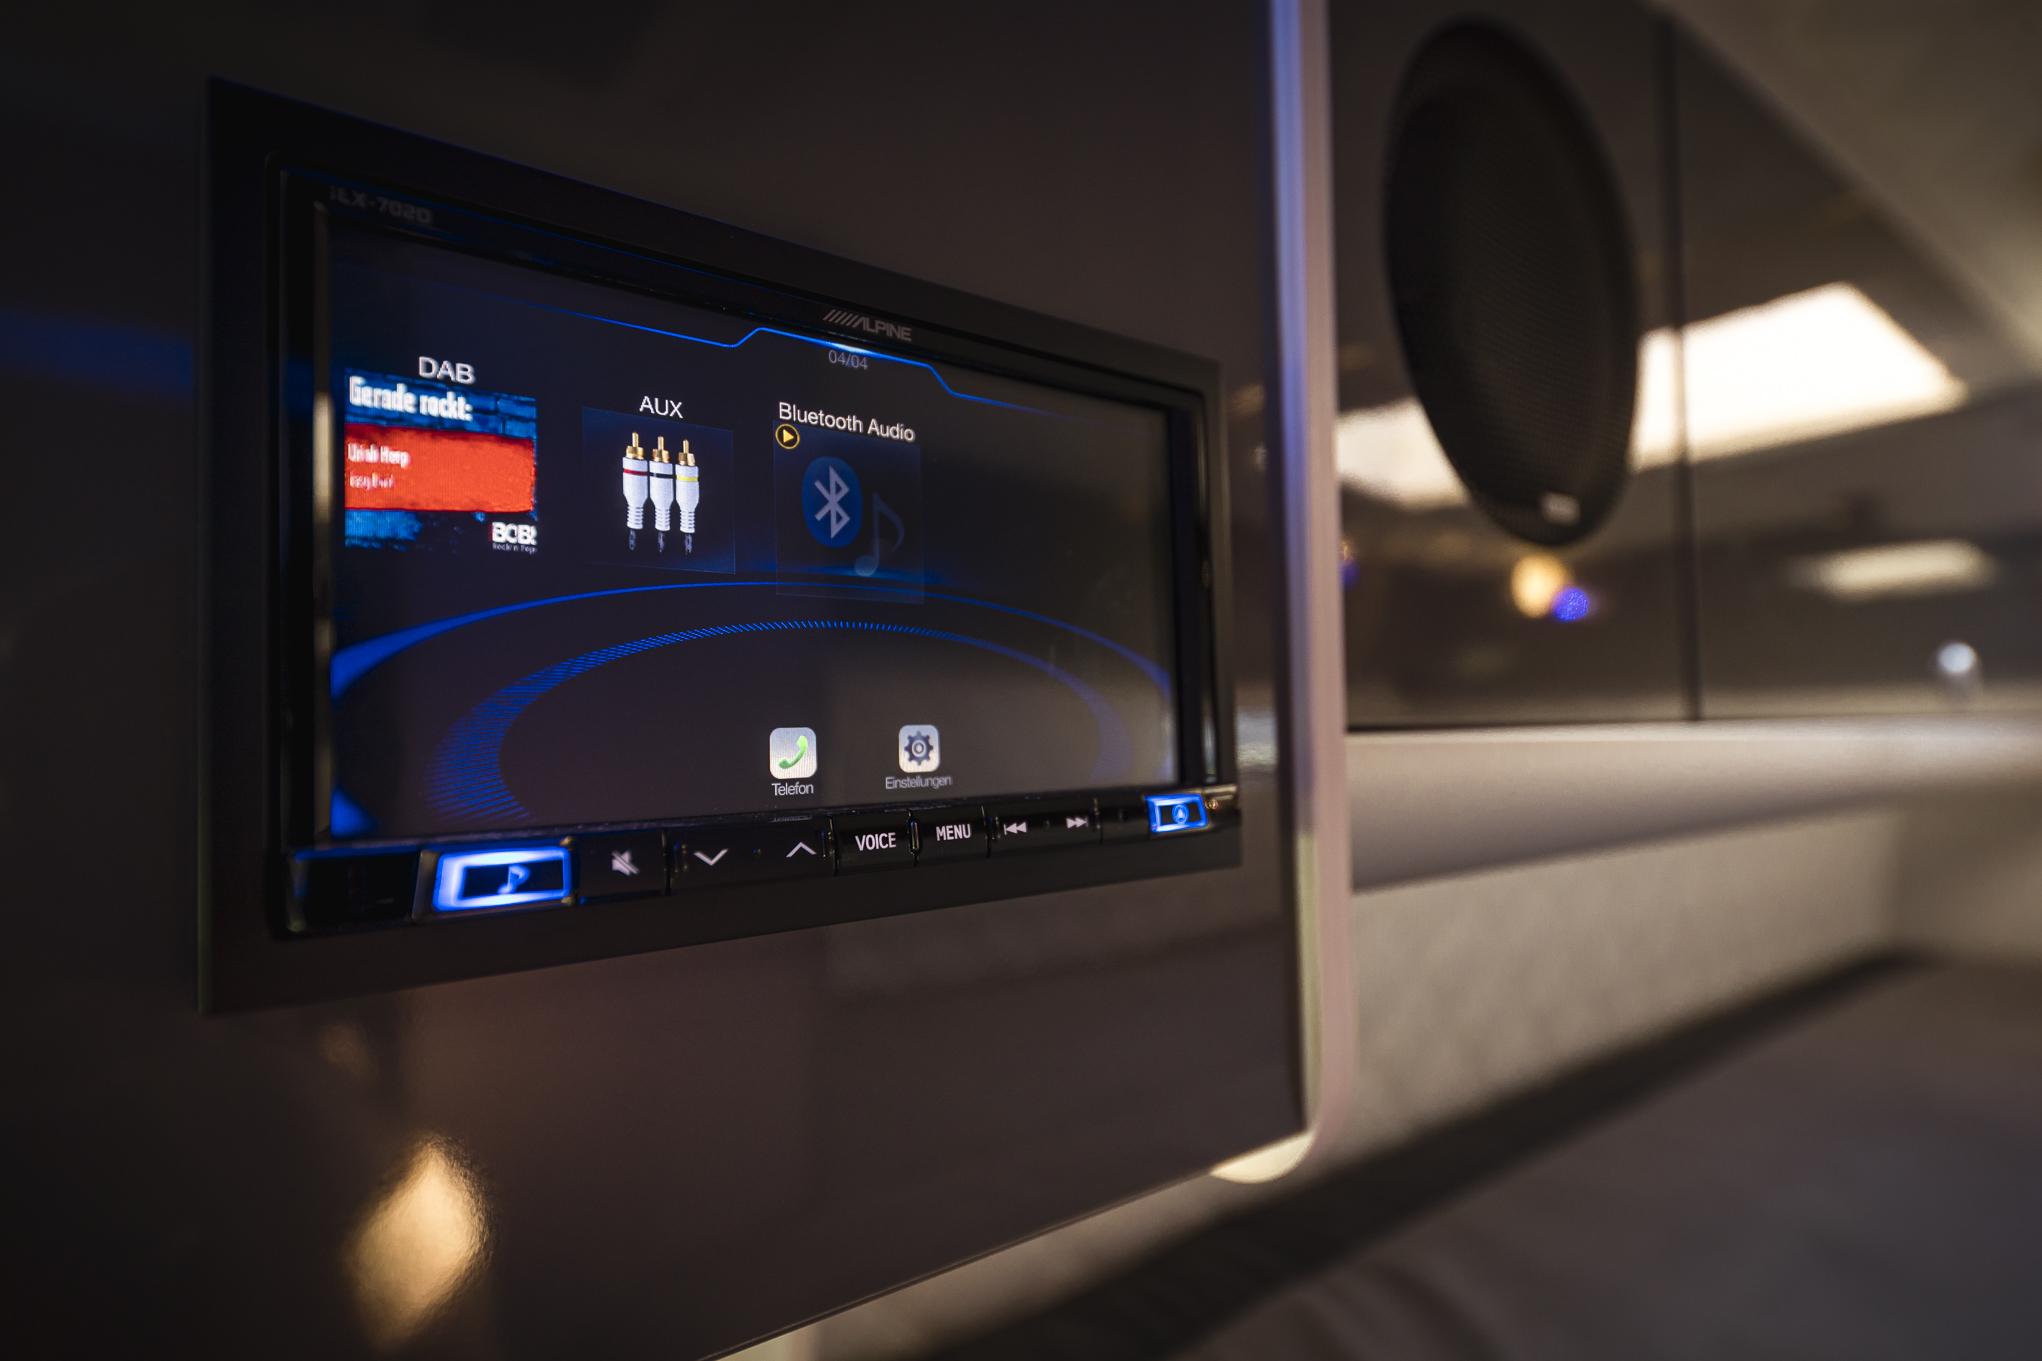 MAN tge multimedia surround system